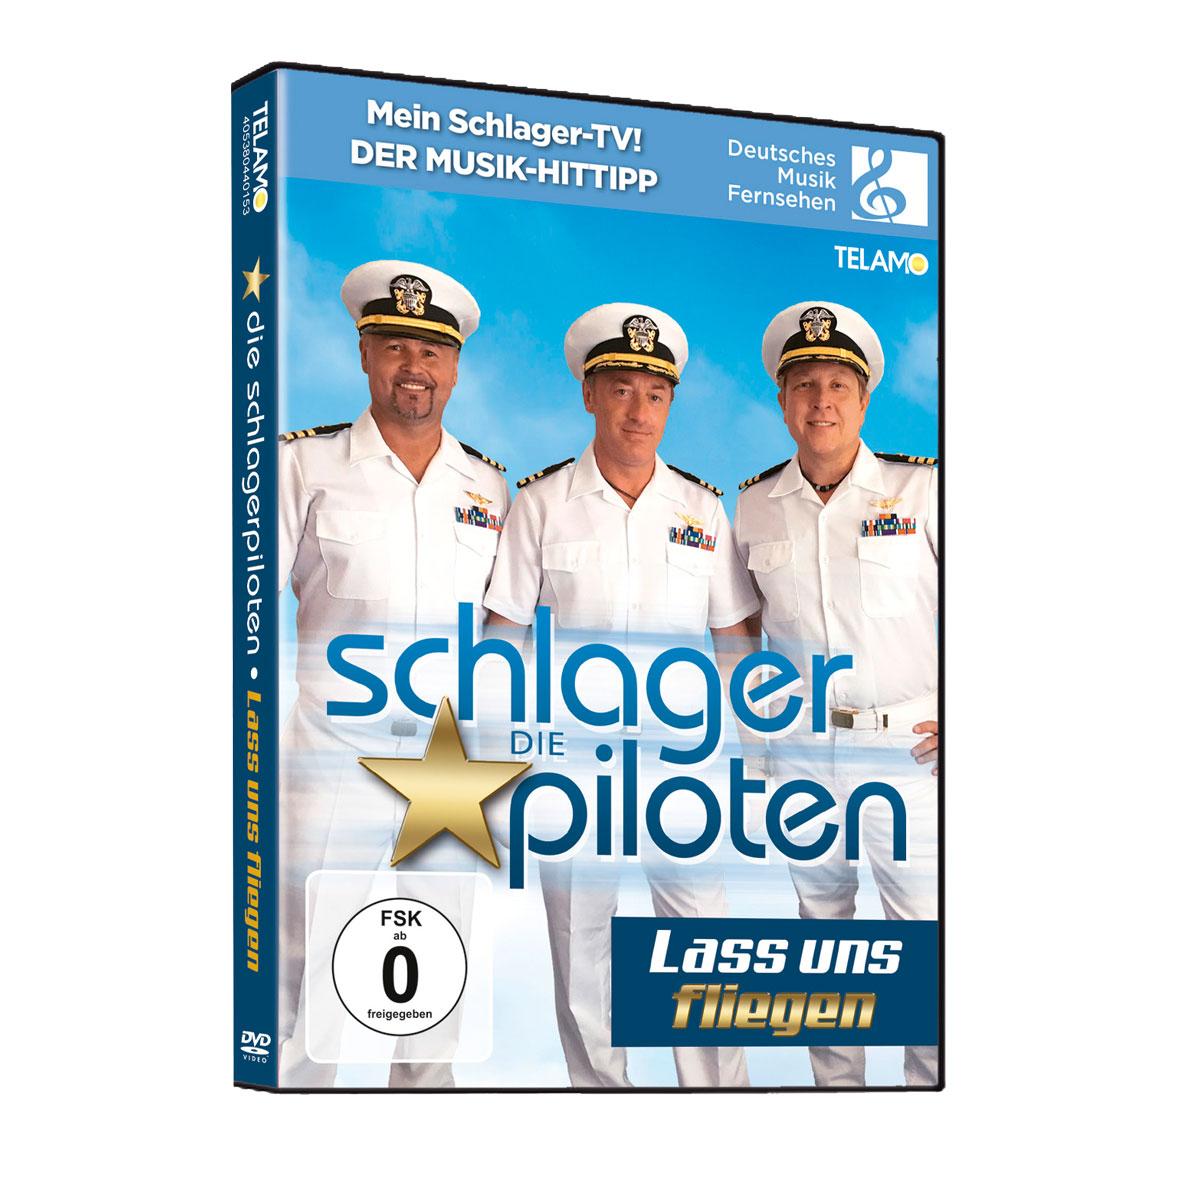 Die Schlagerpiloten - Lass uns fliegen DVD Cover